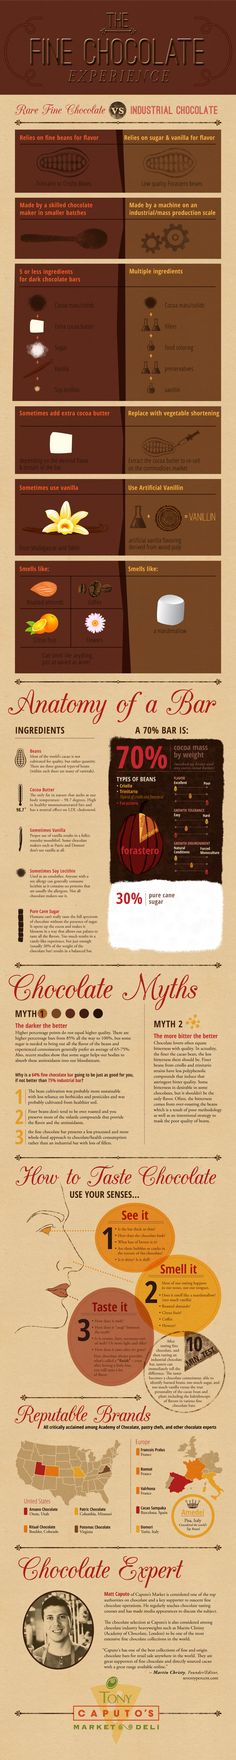 Fine Chocolate Experience Infographic from Caputos Deli SLC, UT